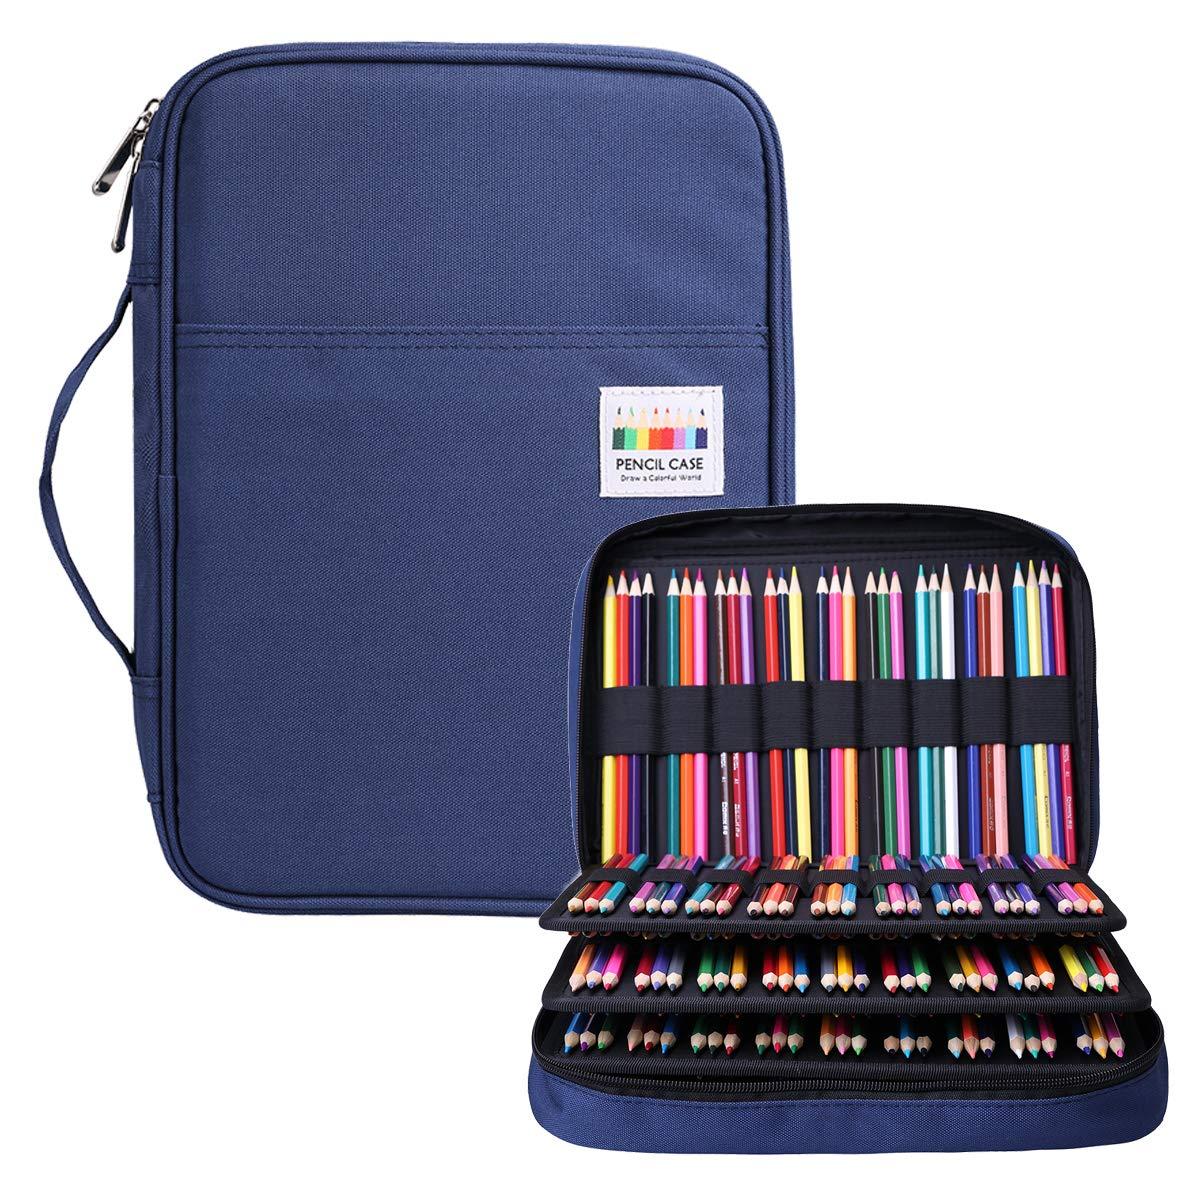 BOMKEE Pencil Case 220 Slots Colored Pencils Gel Pen Organizer Bag with Zipper for Student Kids Adults Artist Handy Glitter Gel Pens, Refills, Waterproof Coloring Holder Pencils Case(Blue)